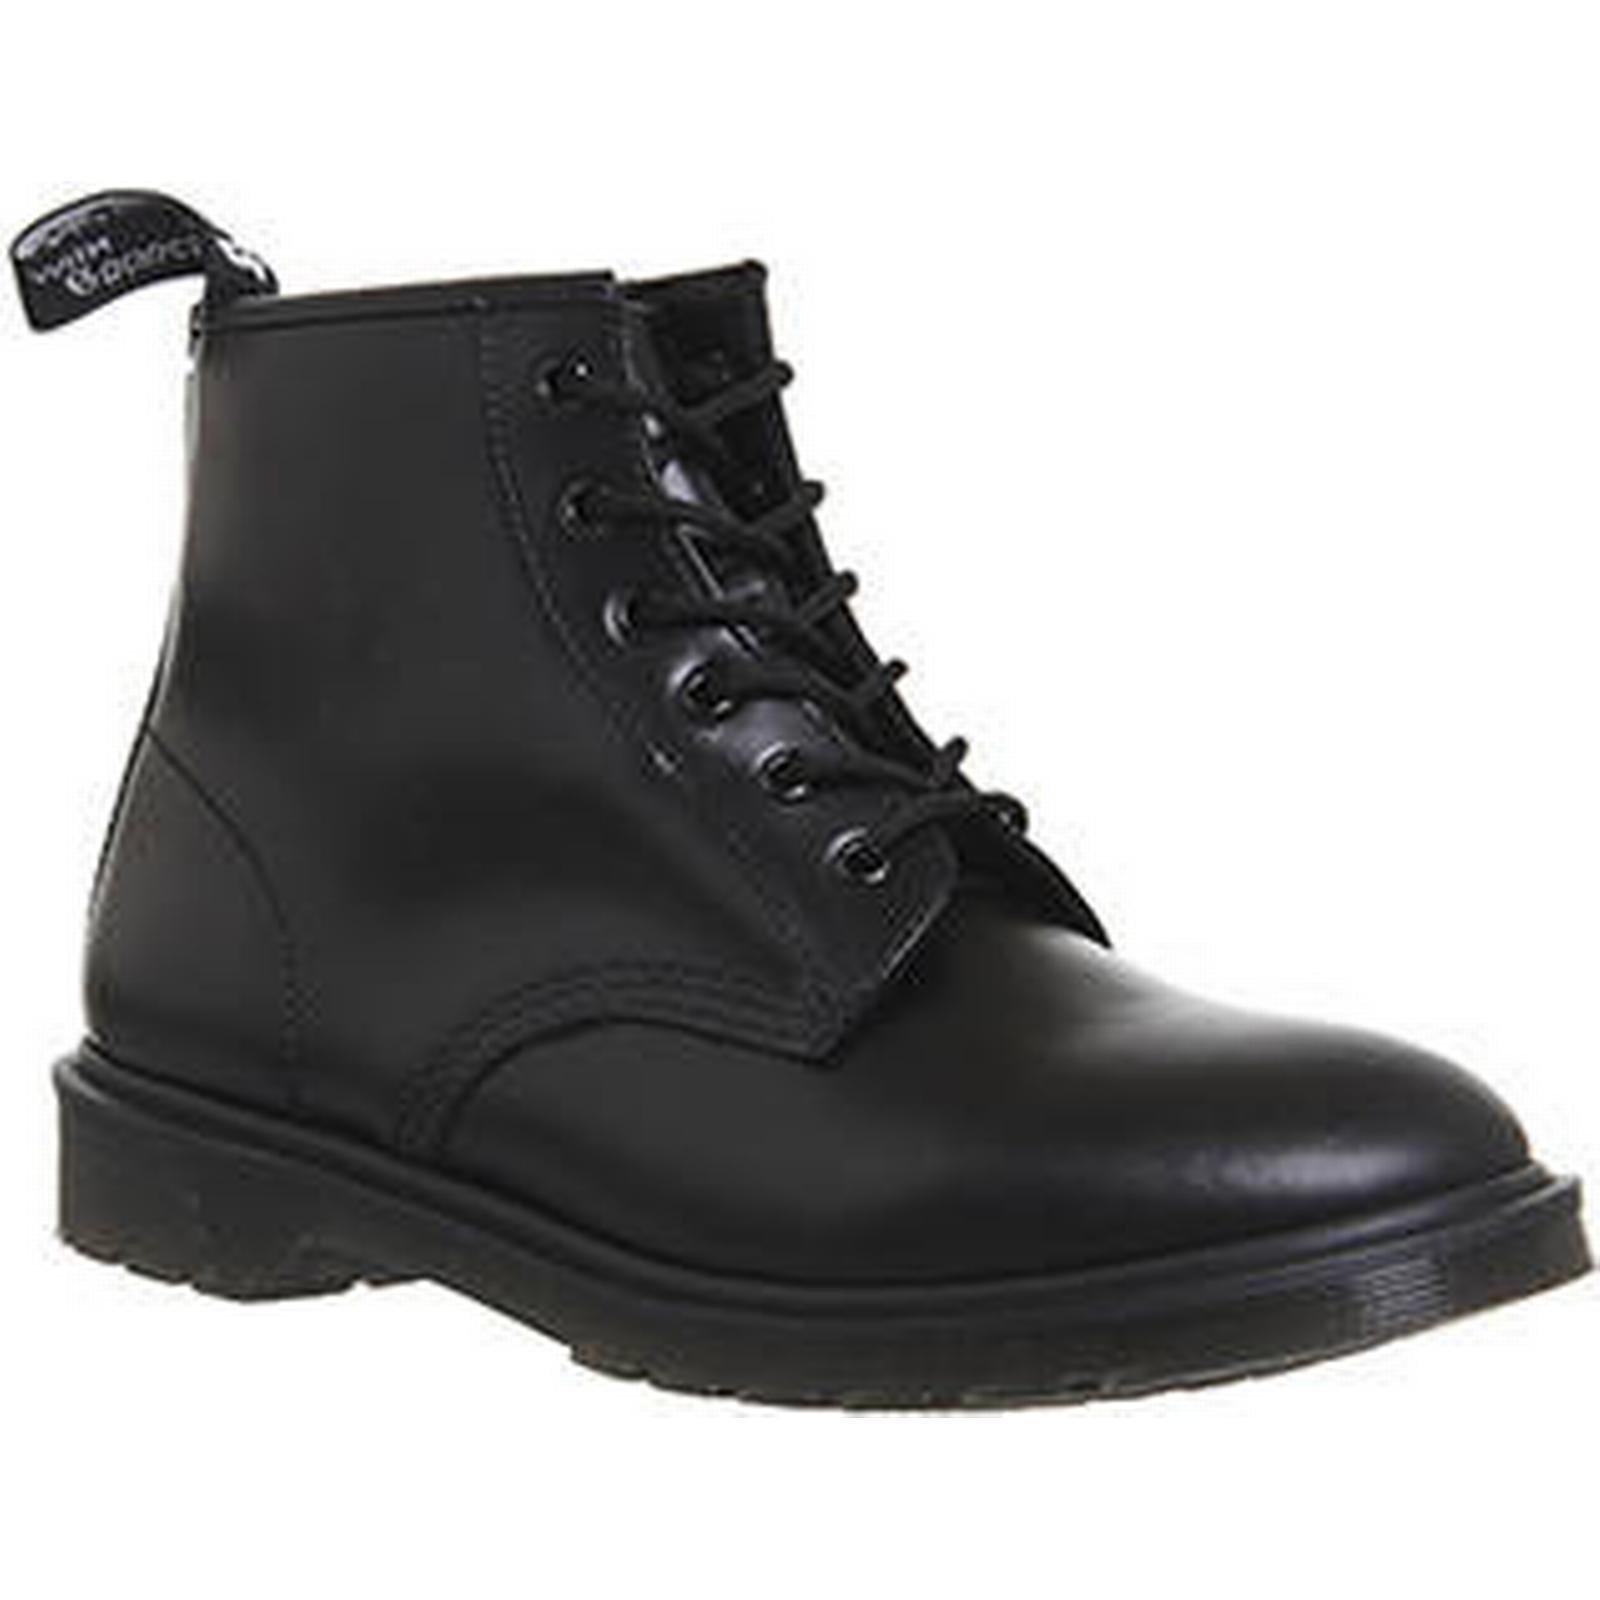 Dr. Martens 101 Boot BRANDO BLACK BRANDO Boot LEATHER 09bd70